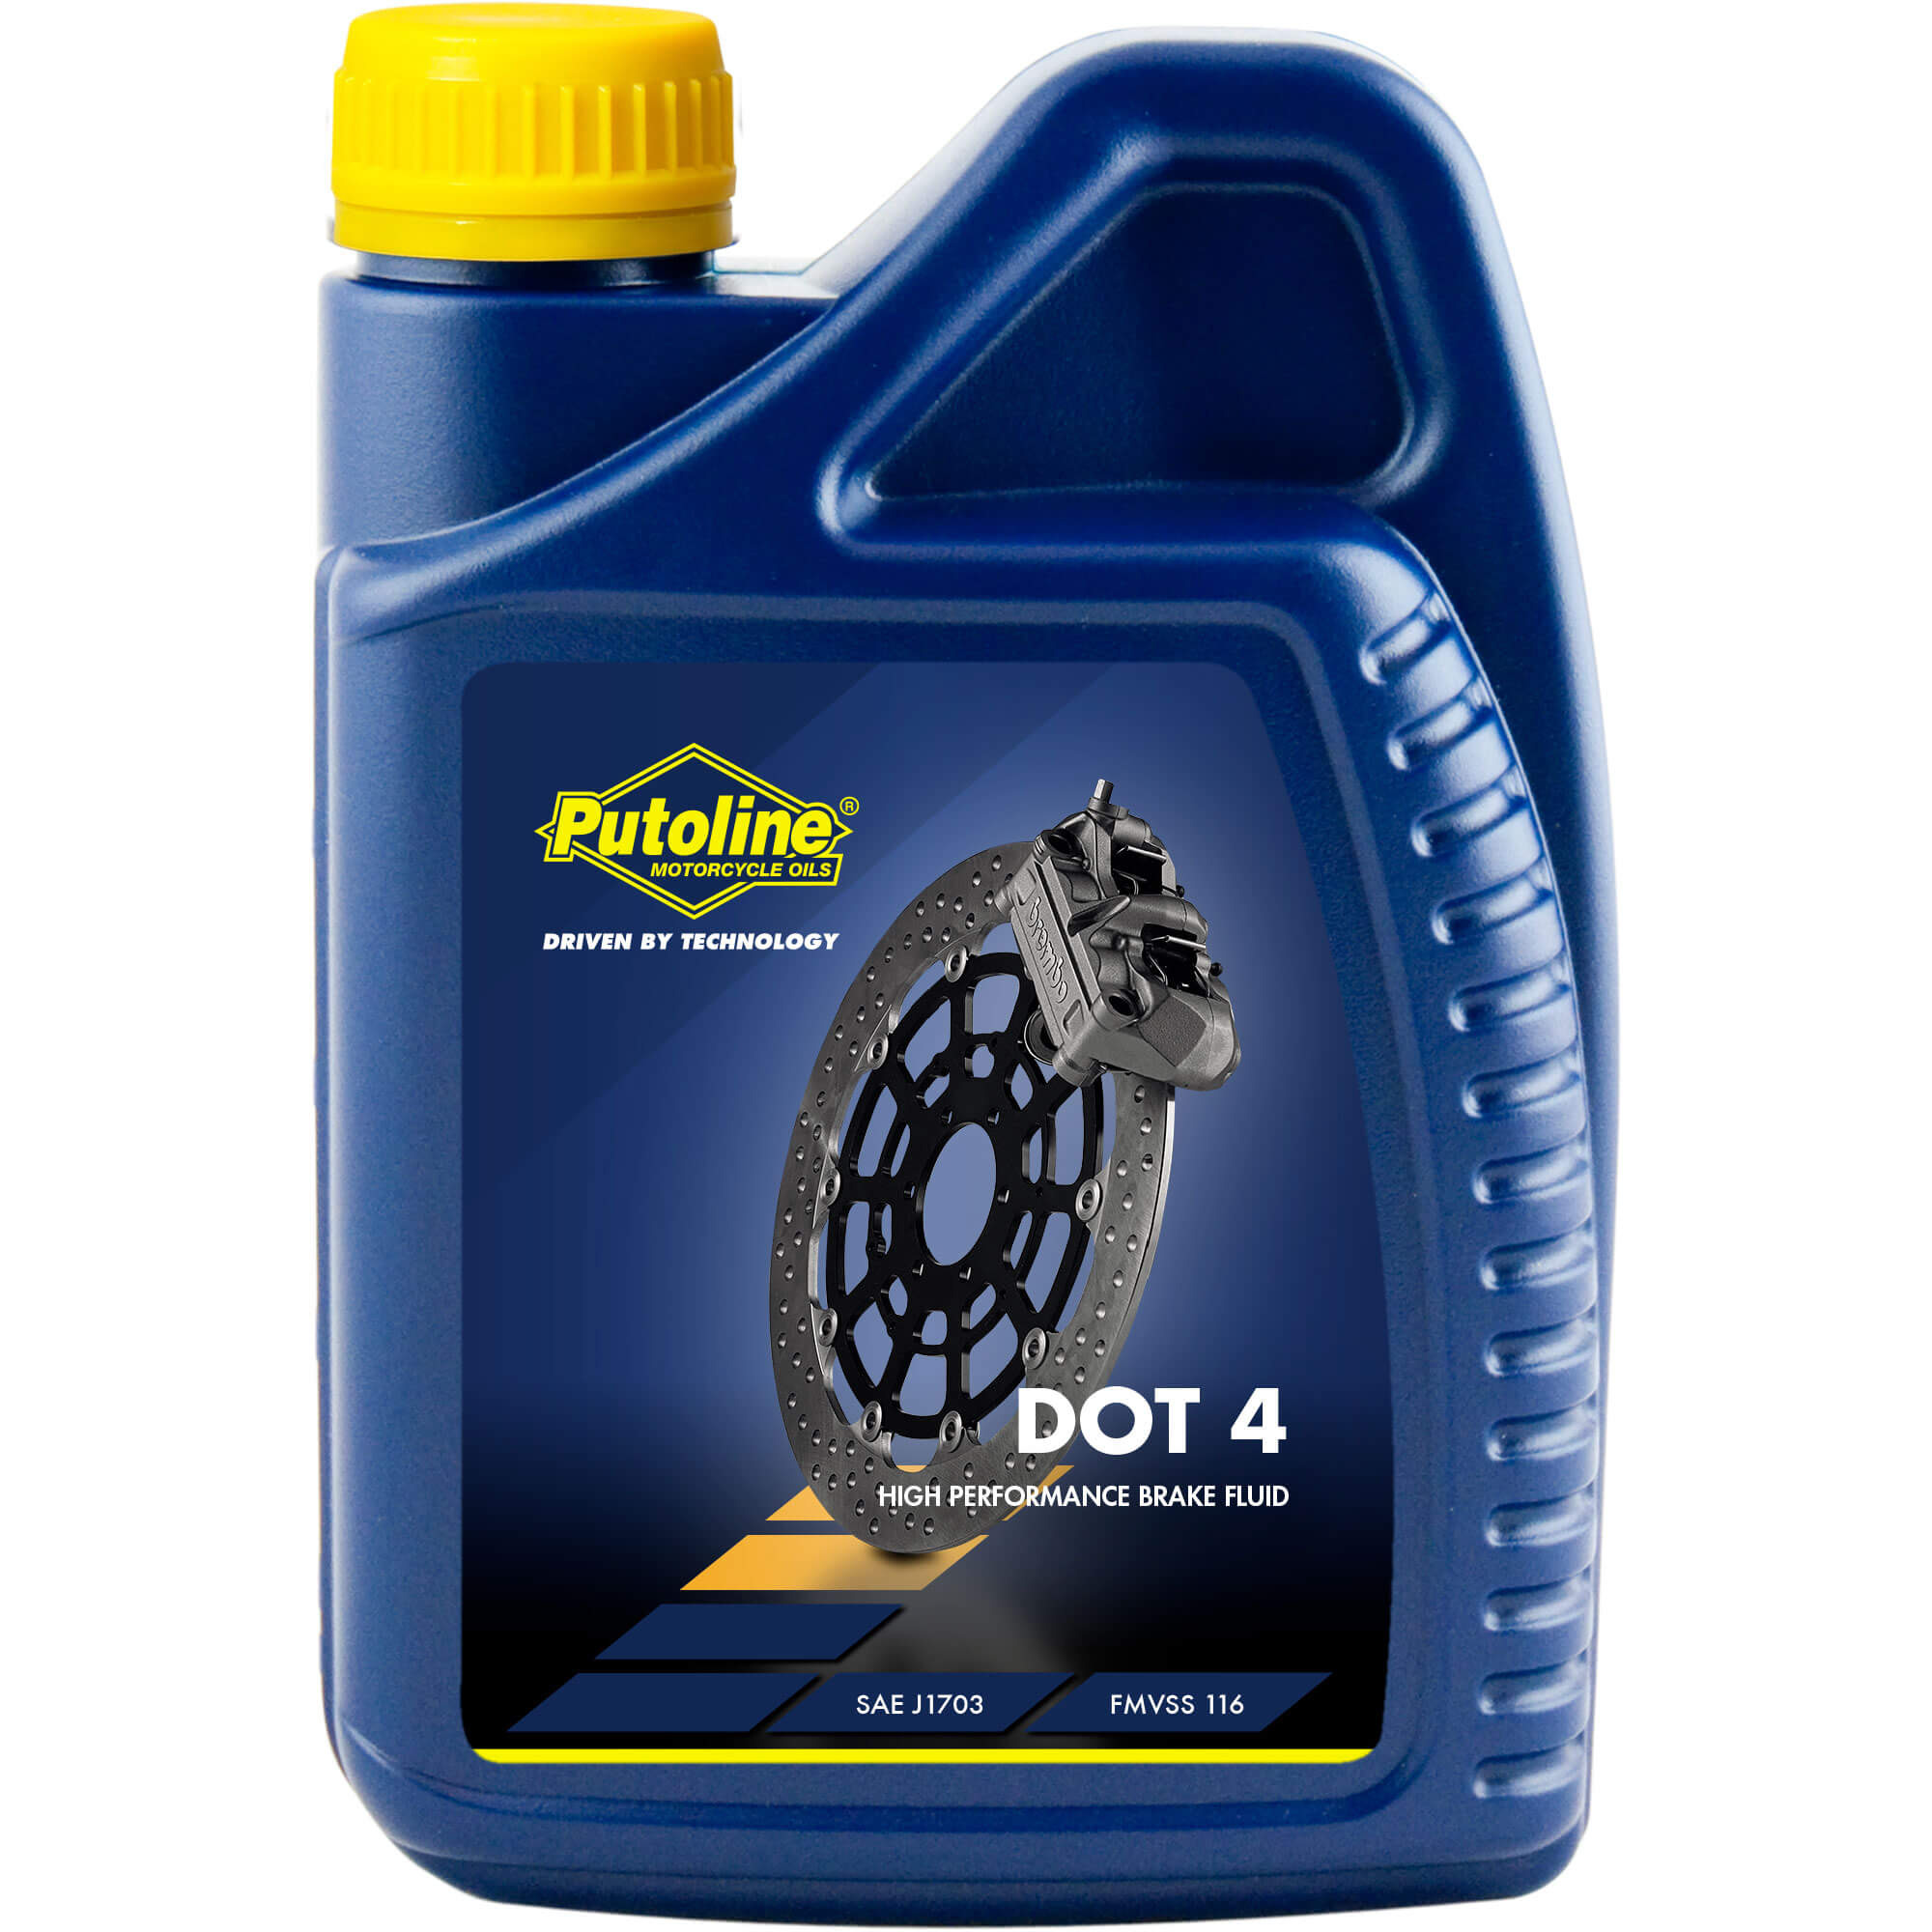 1L Liquide de frein Putoline DOT 4 Brake Fluid